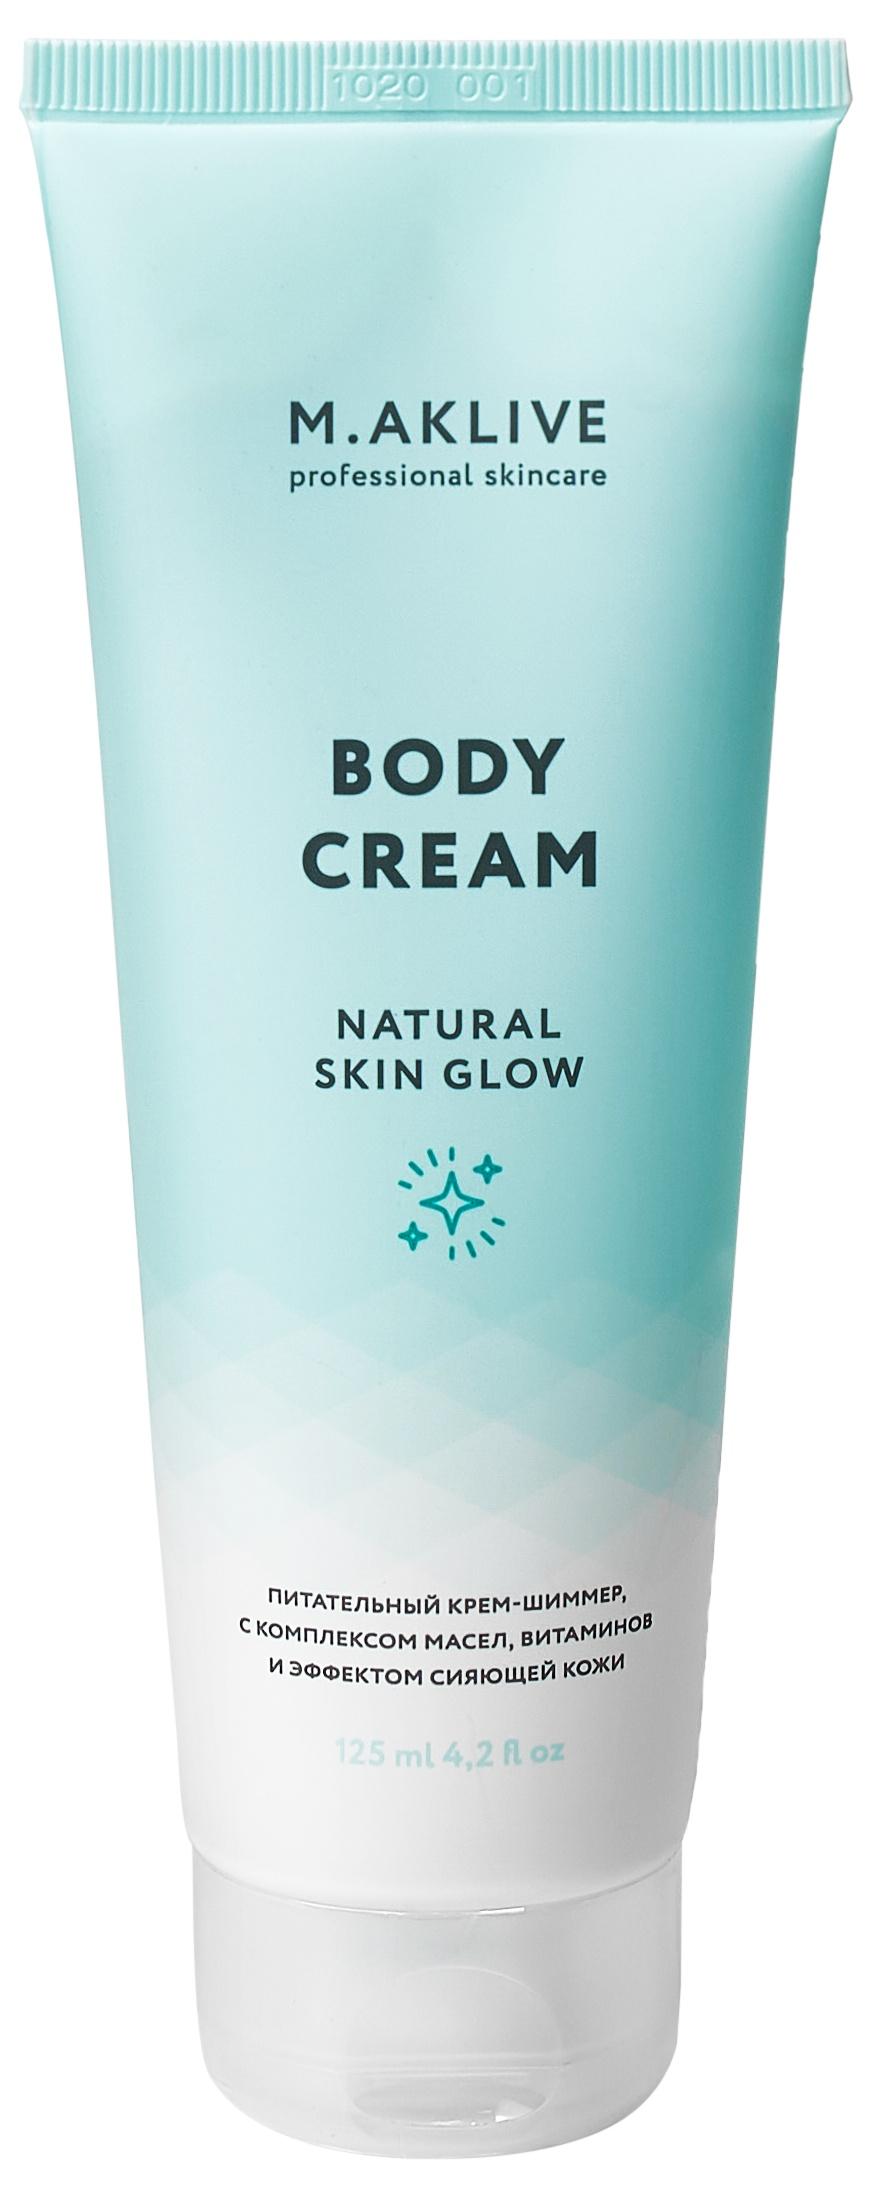 "M.AKLIVE Body Cream ""Natural Skin Glow"""